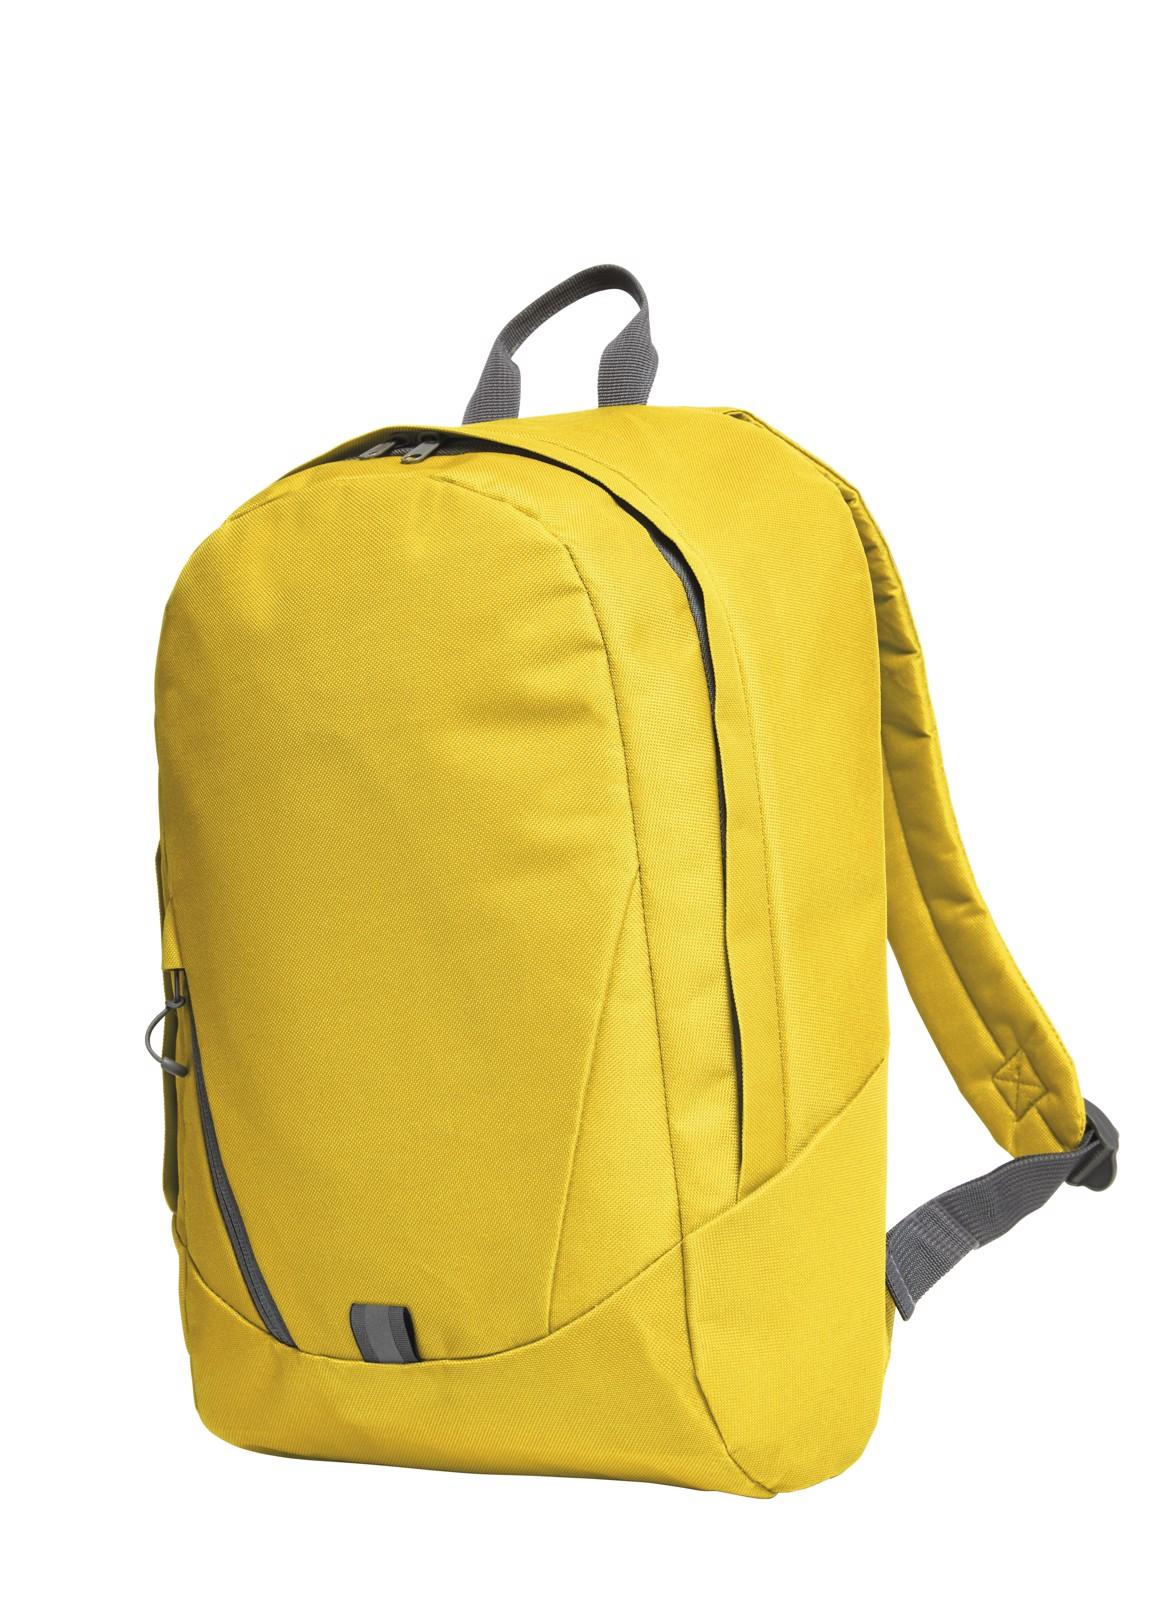 Batoh Solution - Žlutá